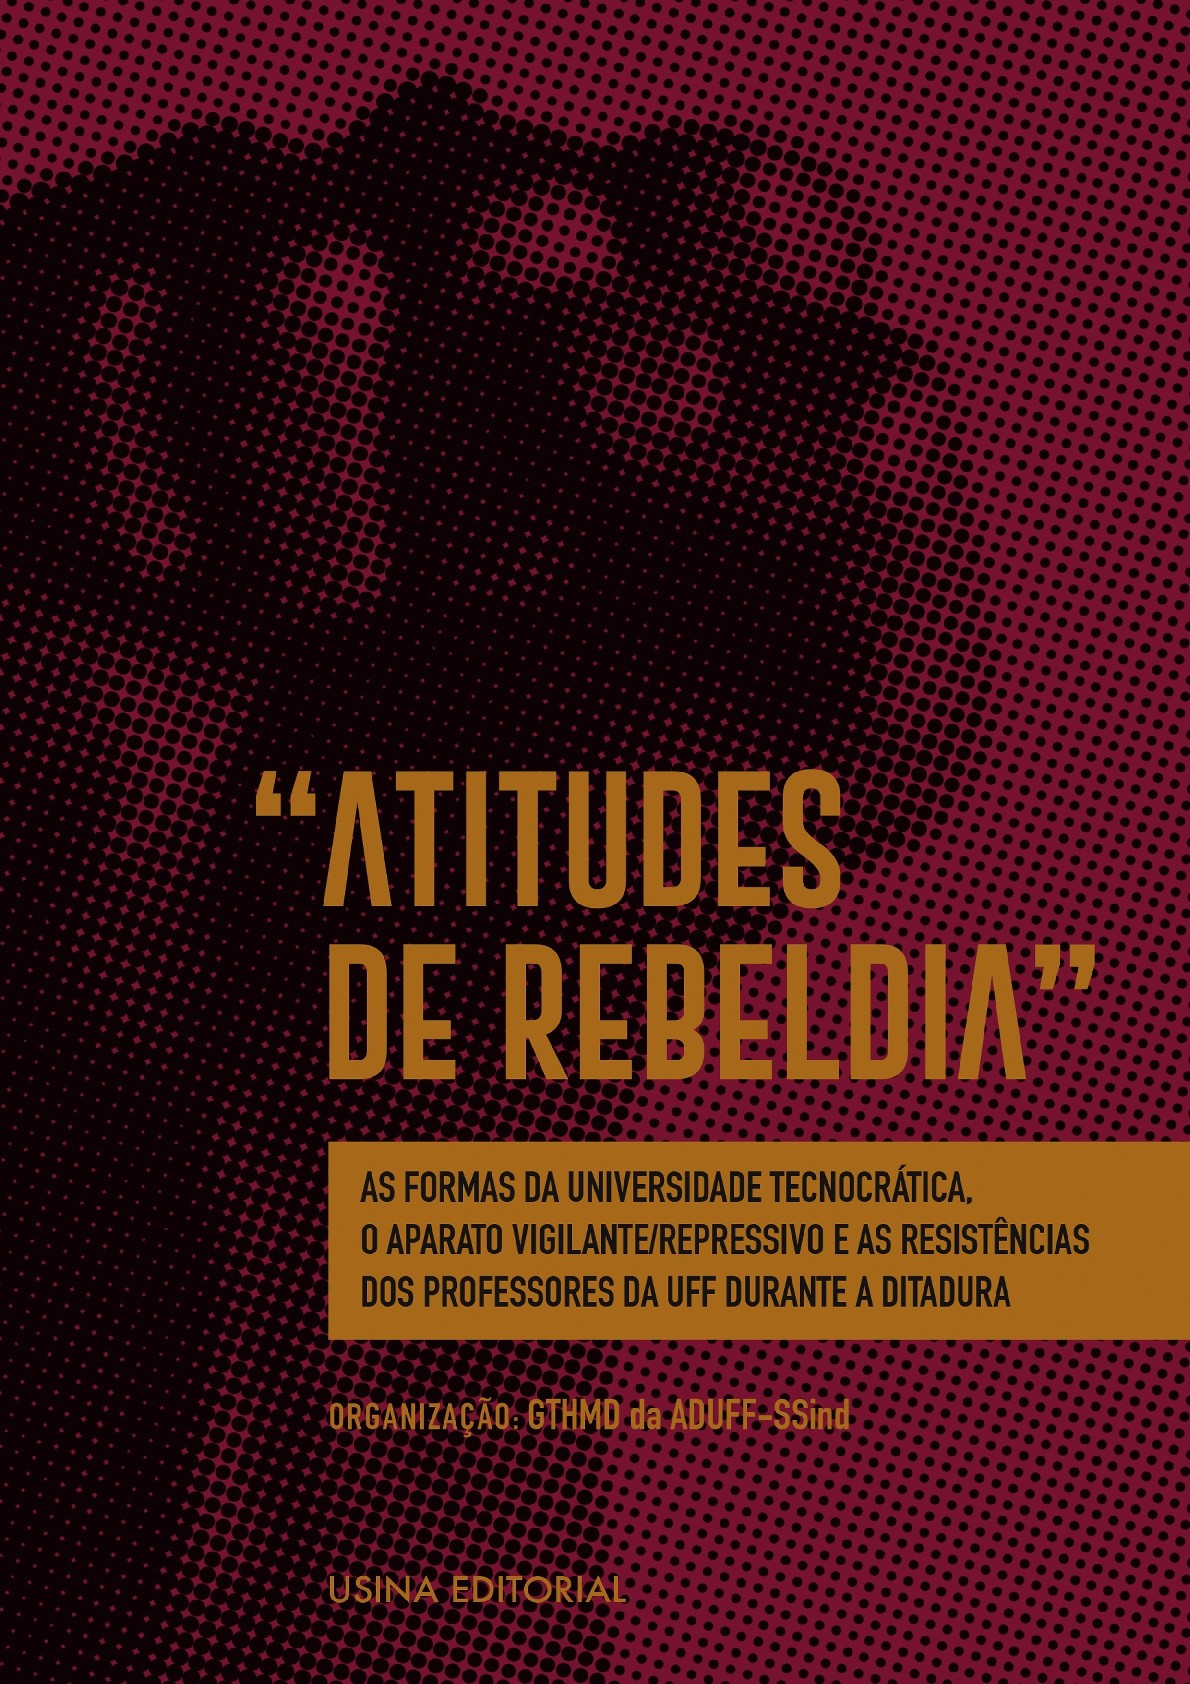 Foto 1 - Atitudes de Rebeldia